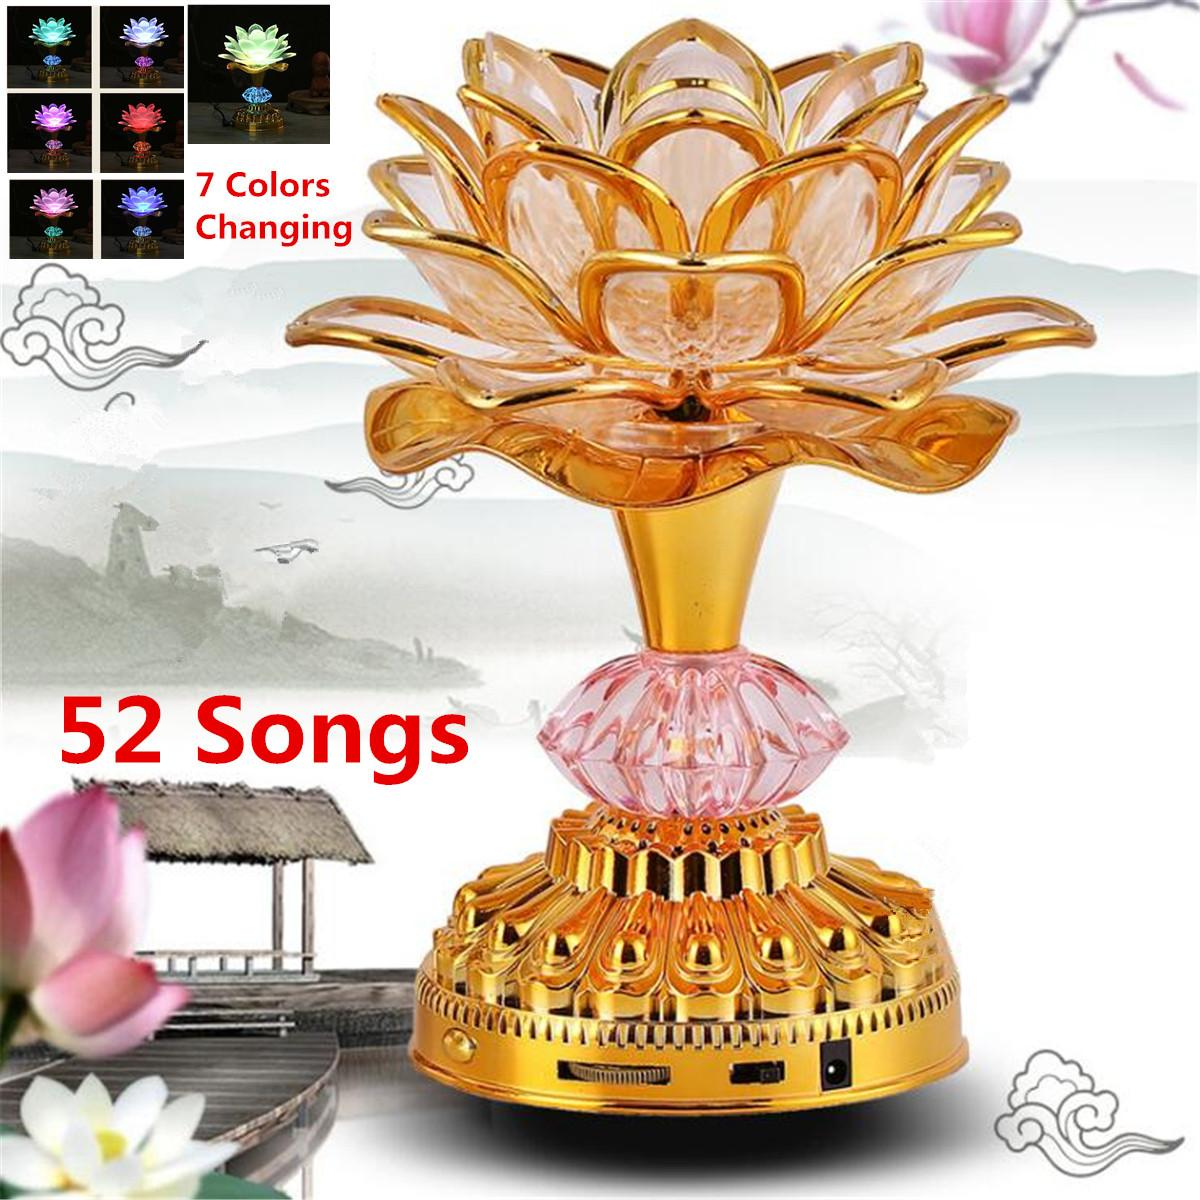 7Color for Lotus Flower Lamp Buddhist Prayer Lamps 52 Buddhist Songs Buddha Music Machine LED Color Changing Temple Light7Color for Lotus Flower Lamp Buddhist Prayer Lamps 52 Buddhist Songs Buddha Music Machine LED Color Changing Temple Light